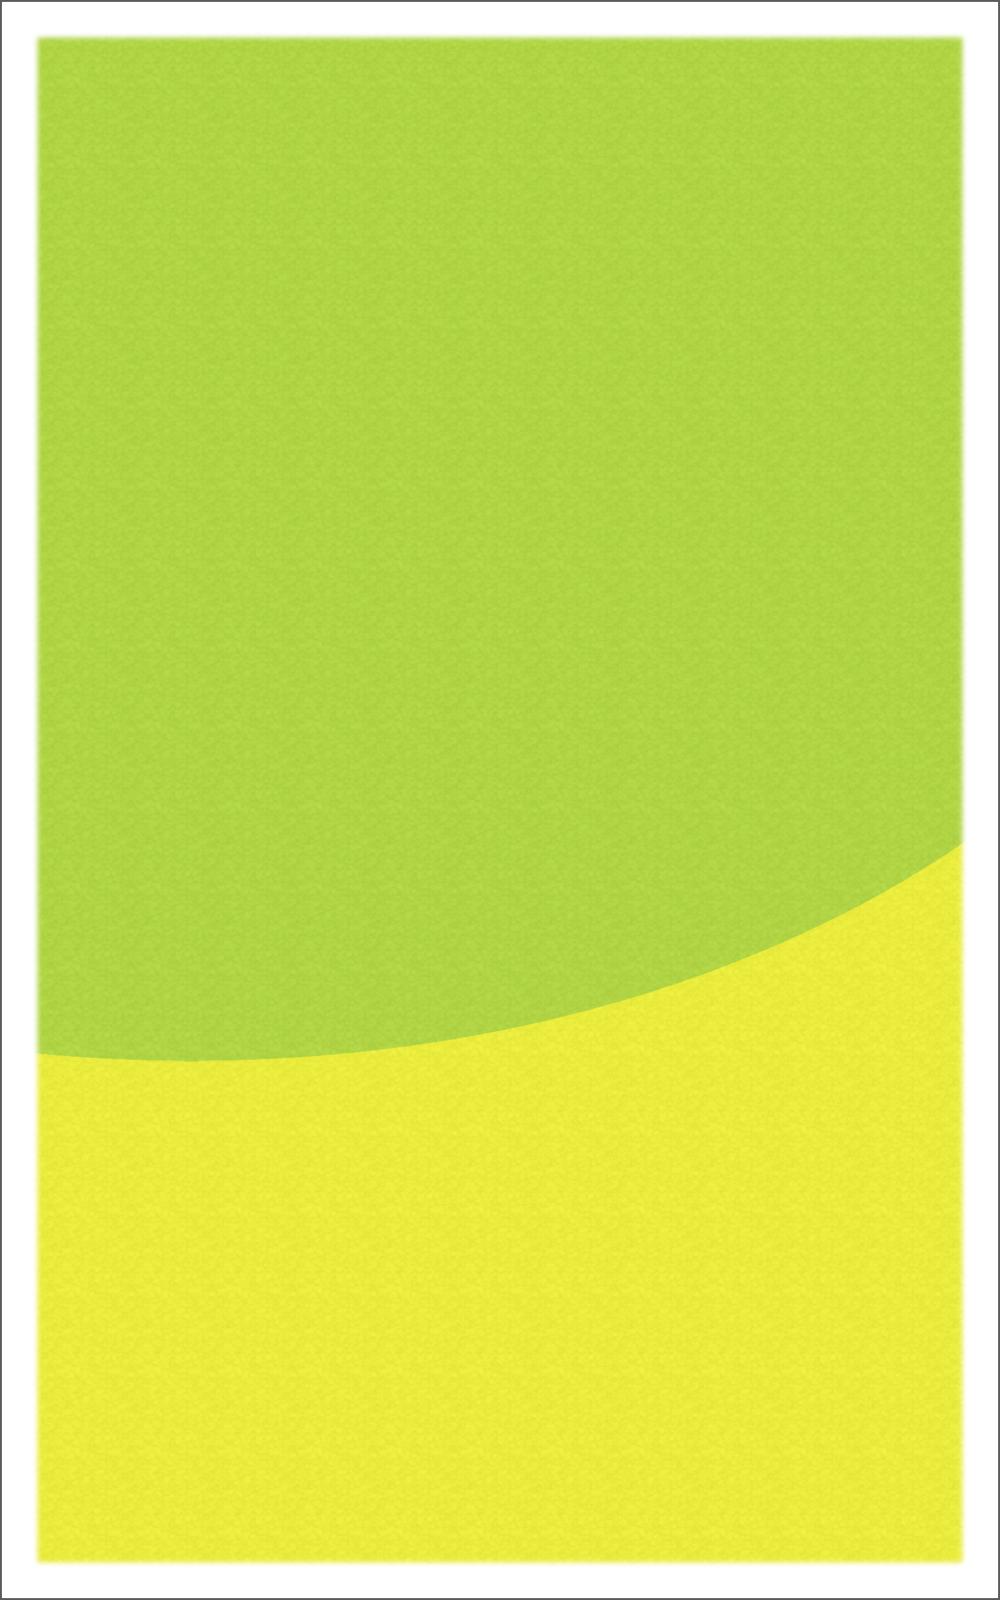 和紙風の表紙画像(1-a)